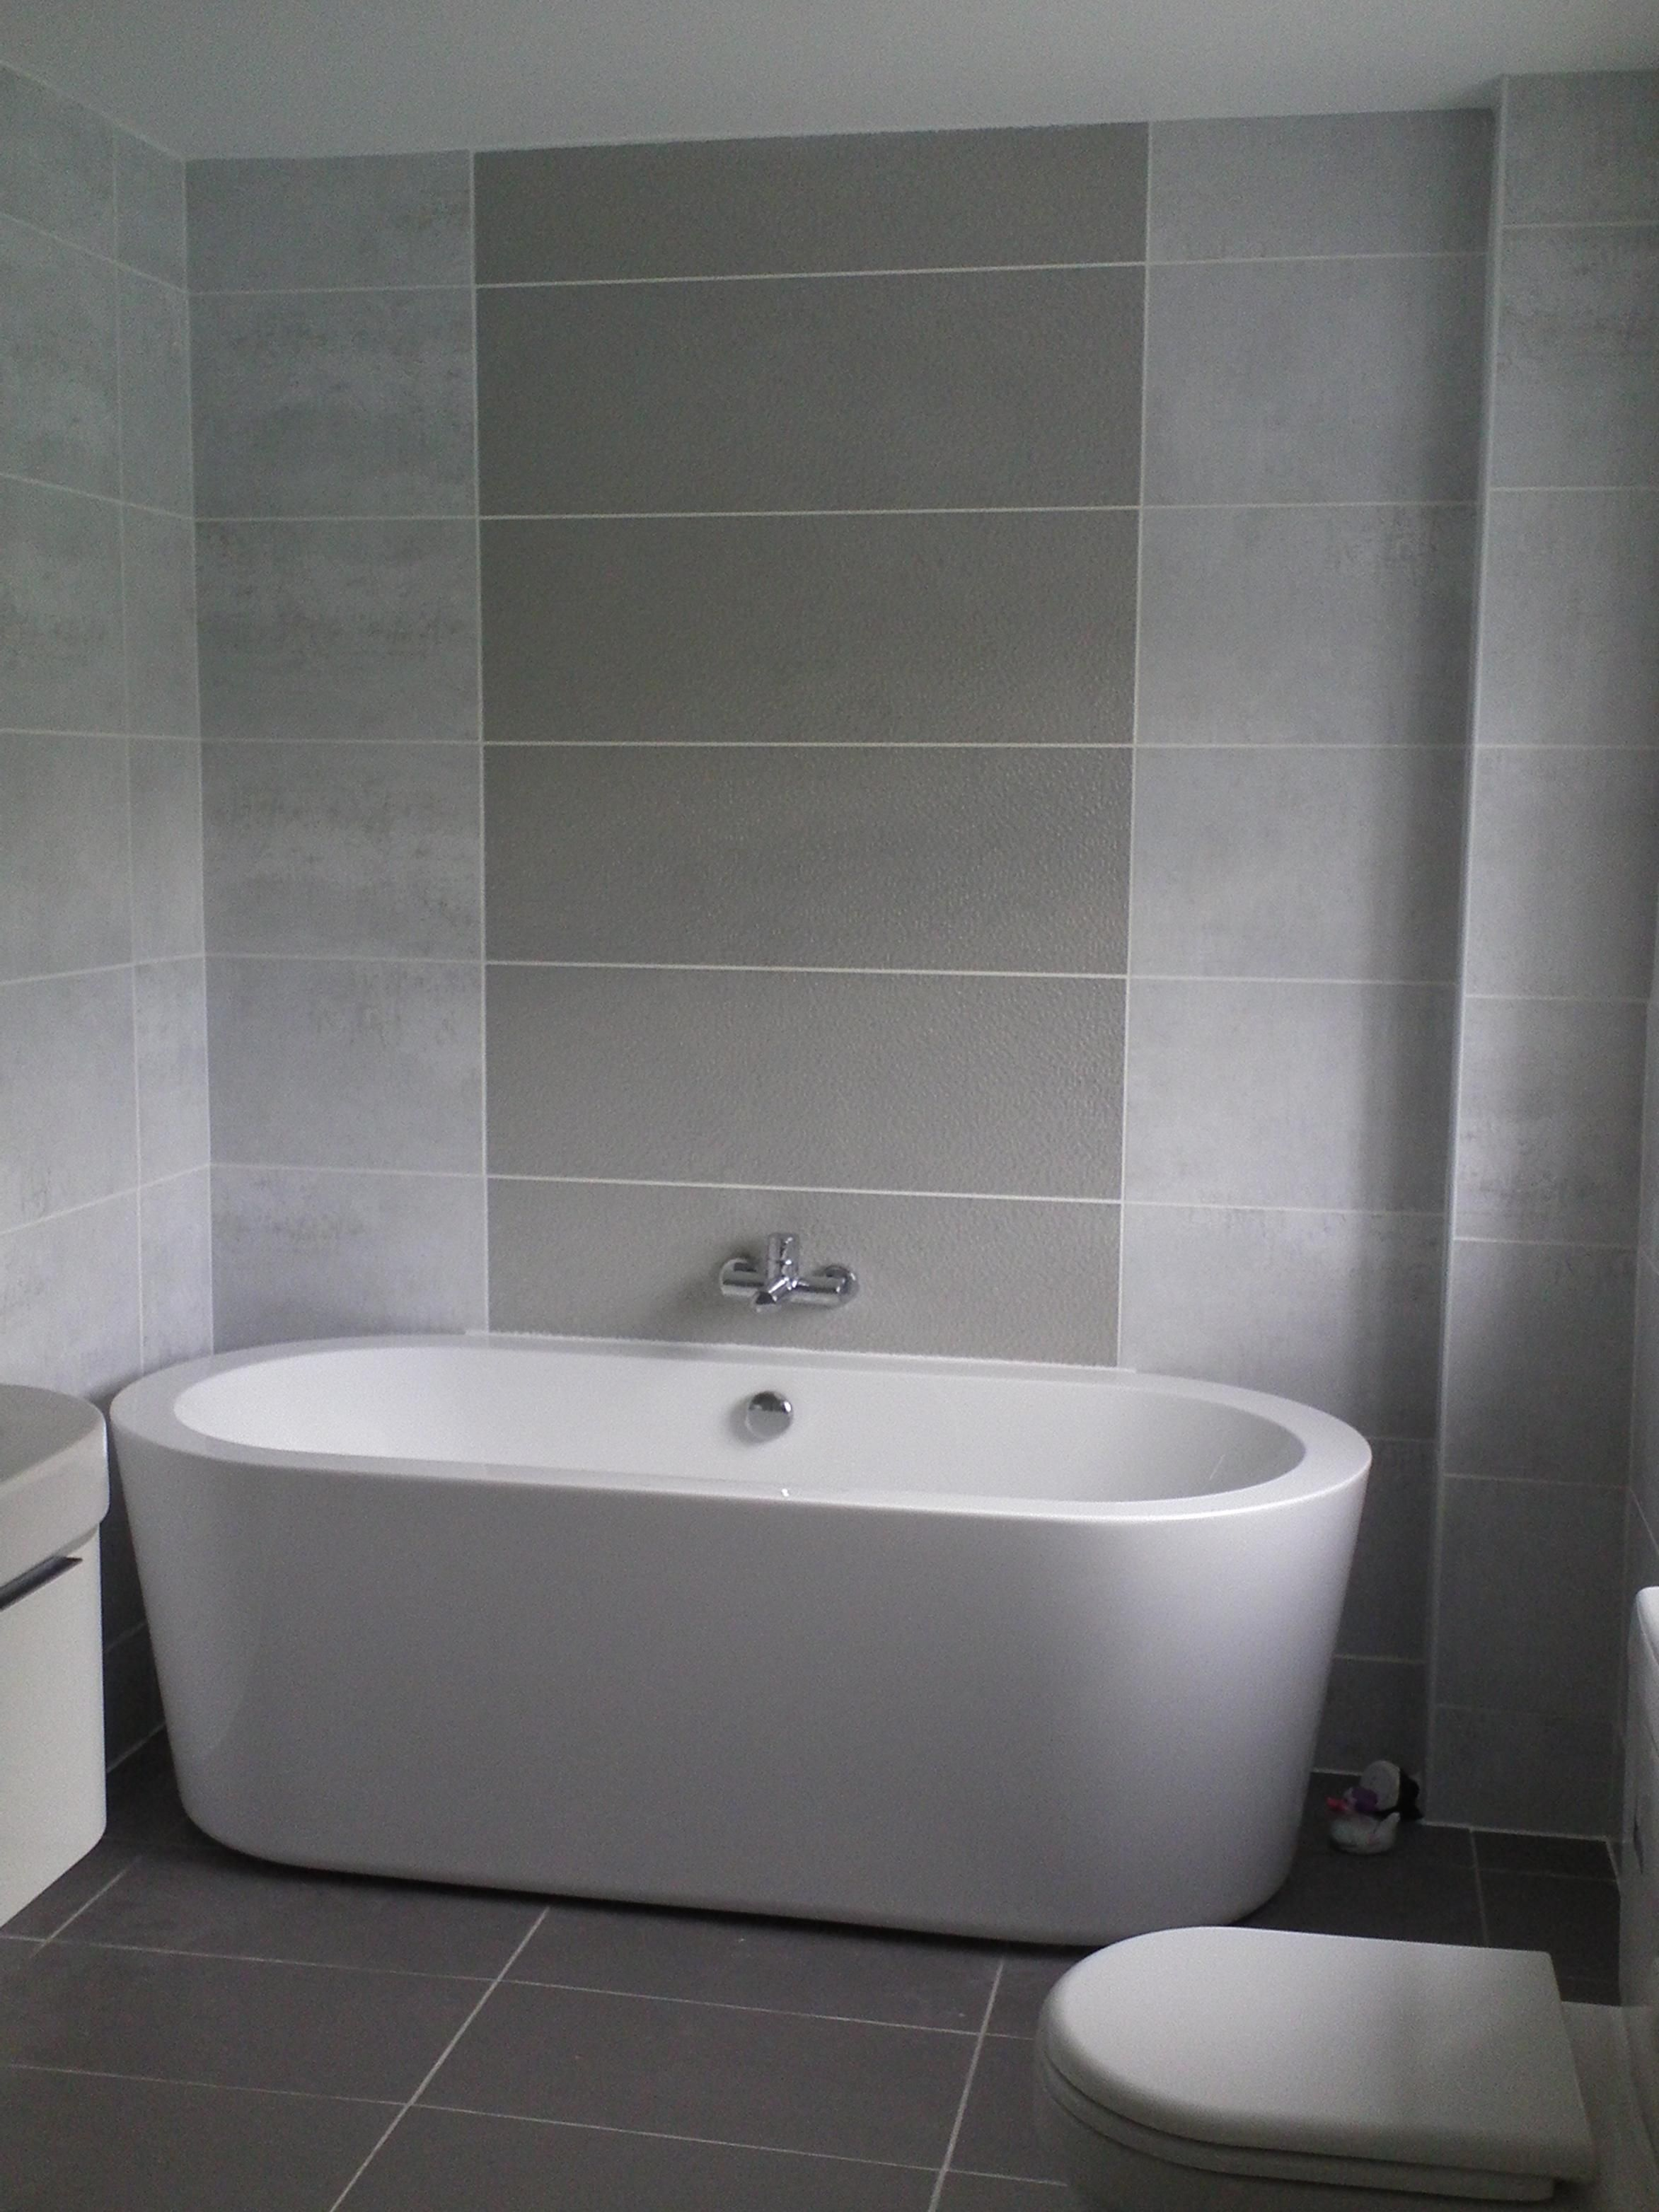 25 Minimalist Small Bathroom Ideas Feel The Big Space Grey Wall Tiles Best Bathroom Designs Tile Bathroom